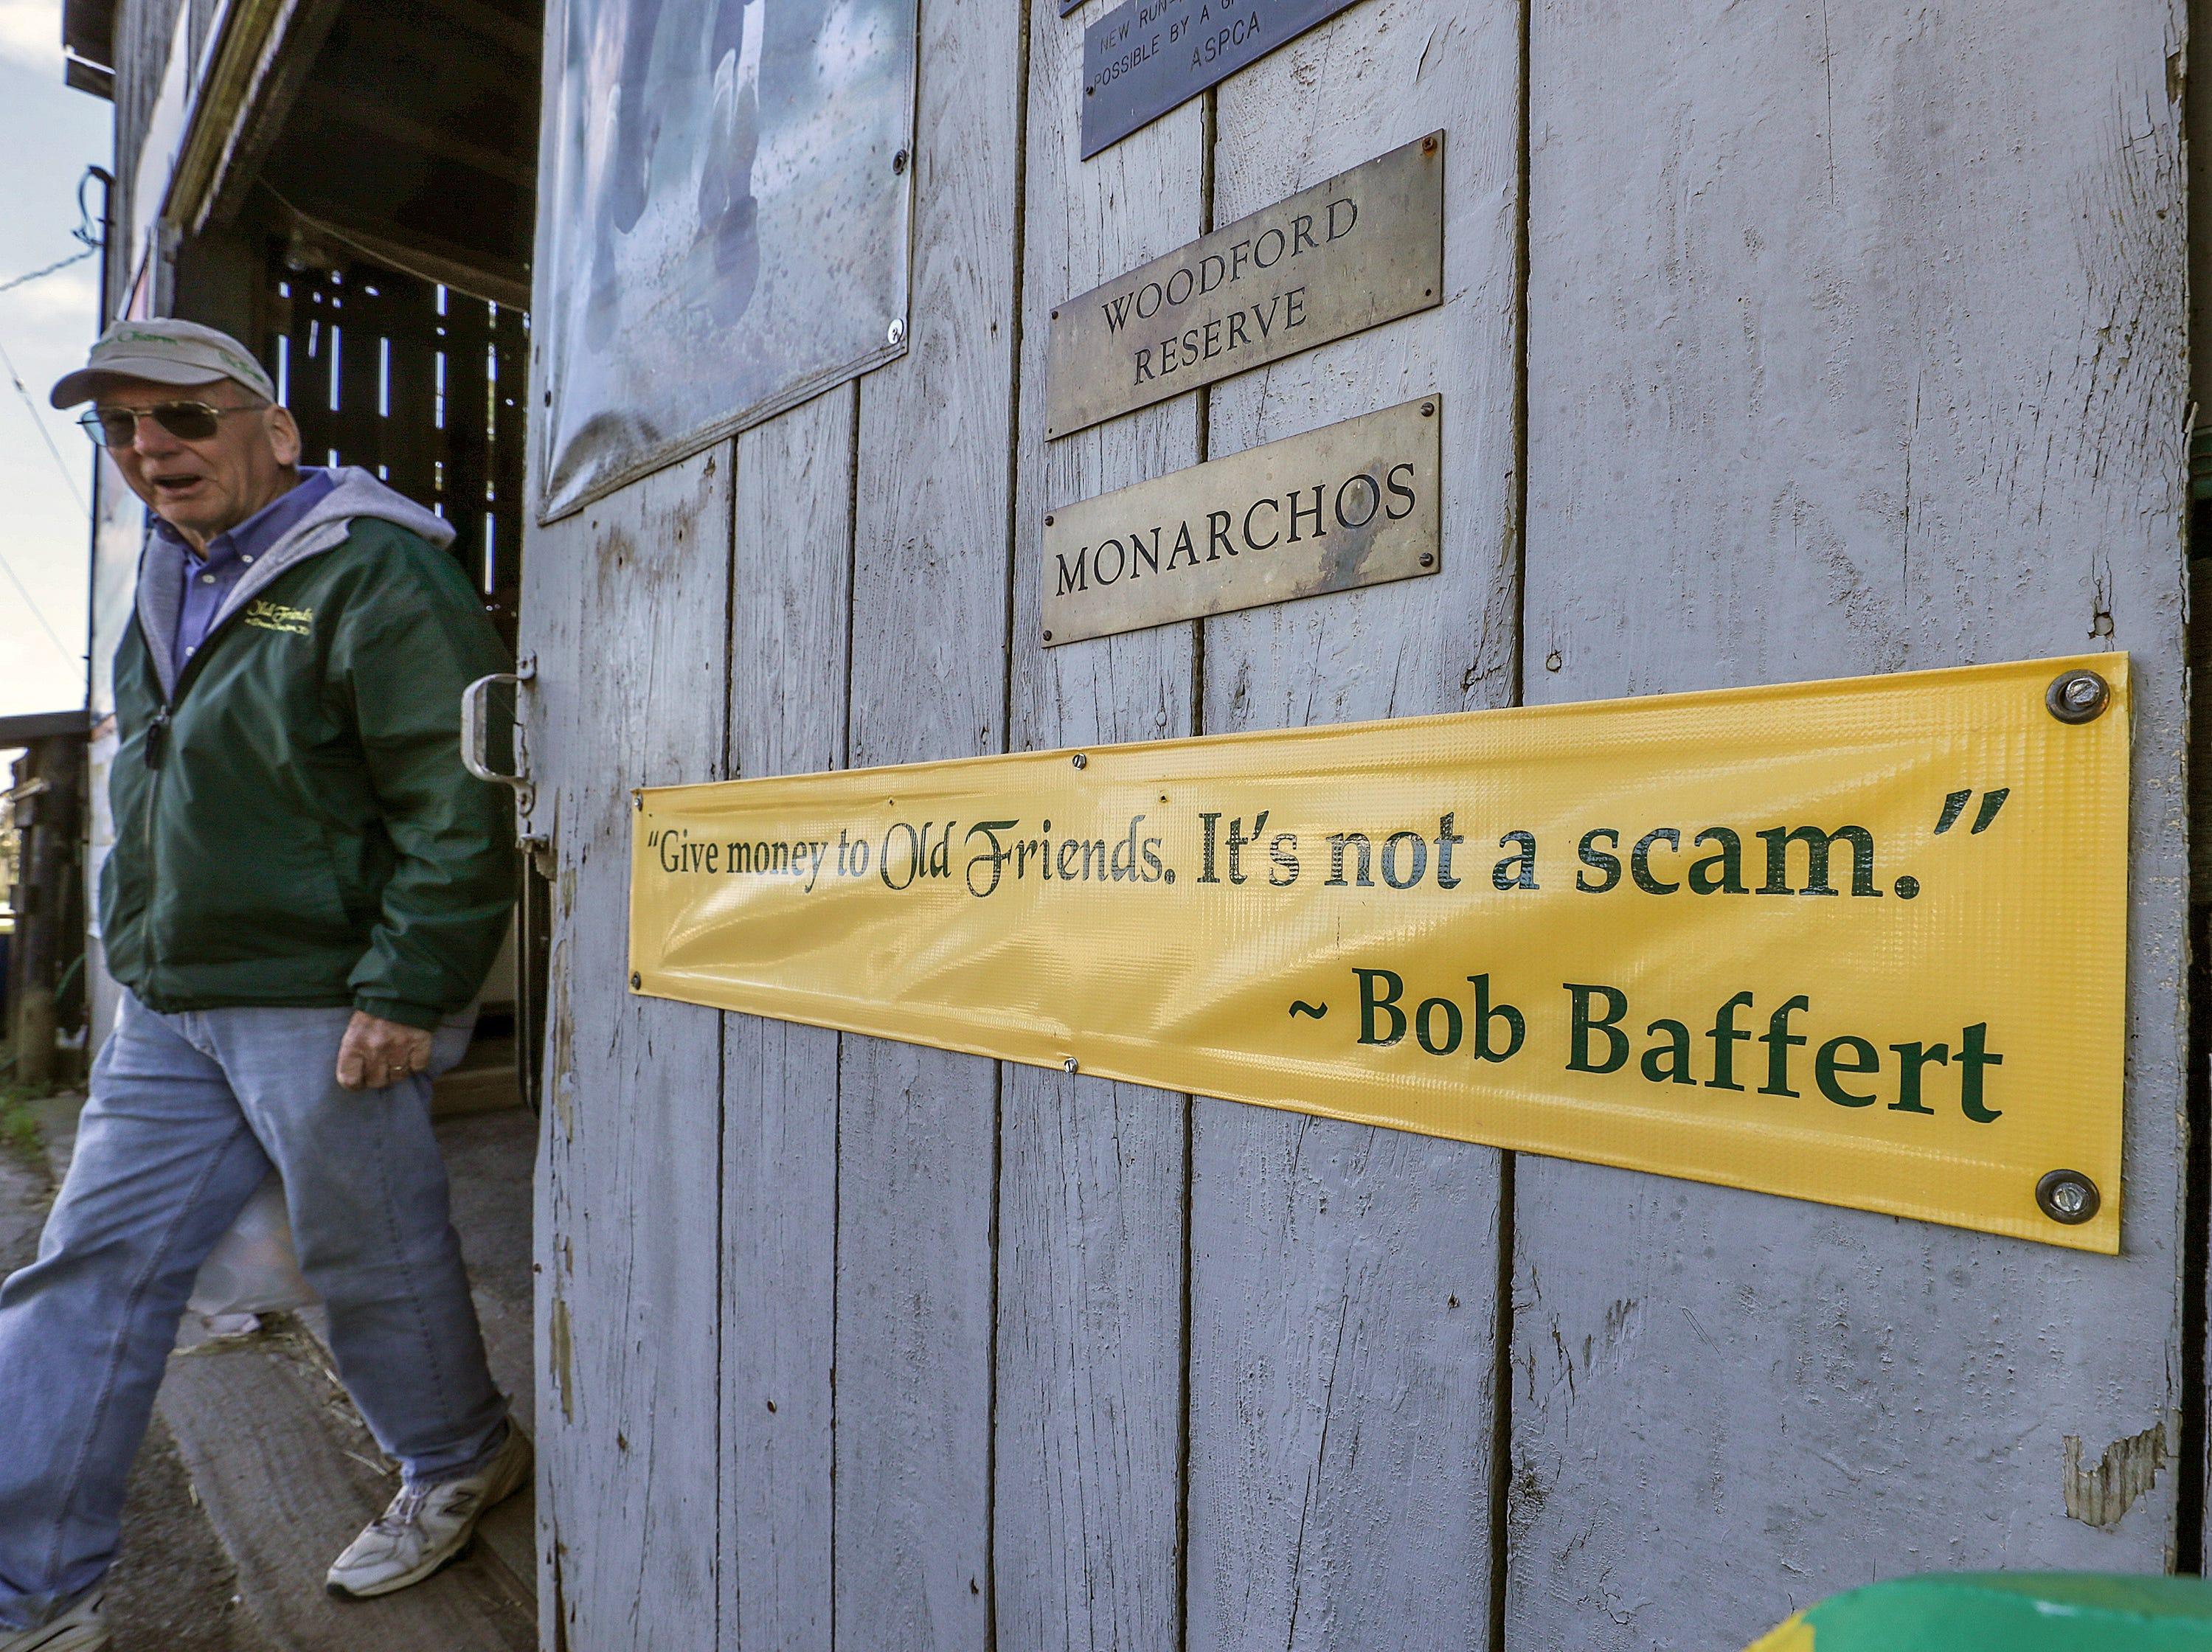 Bob Baffert is a great supporter of Old Friends Farm.October 11, 2018